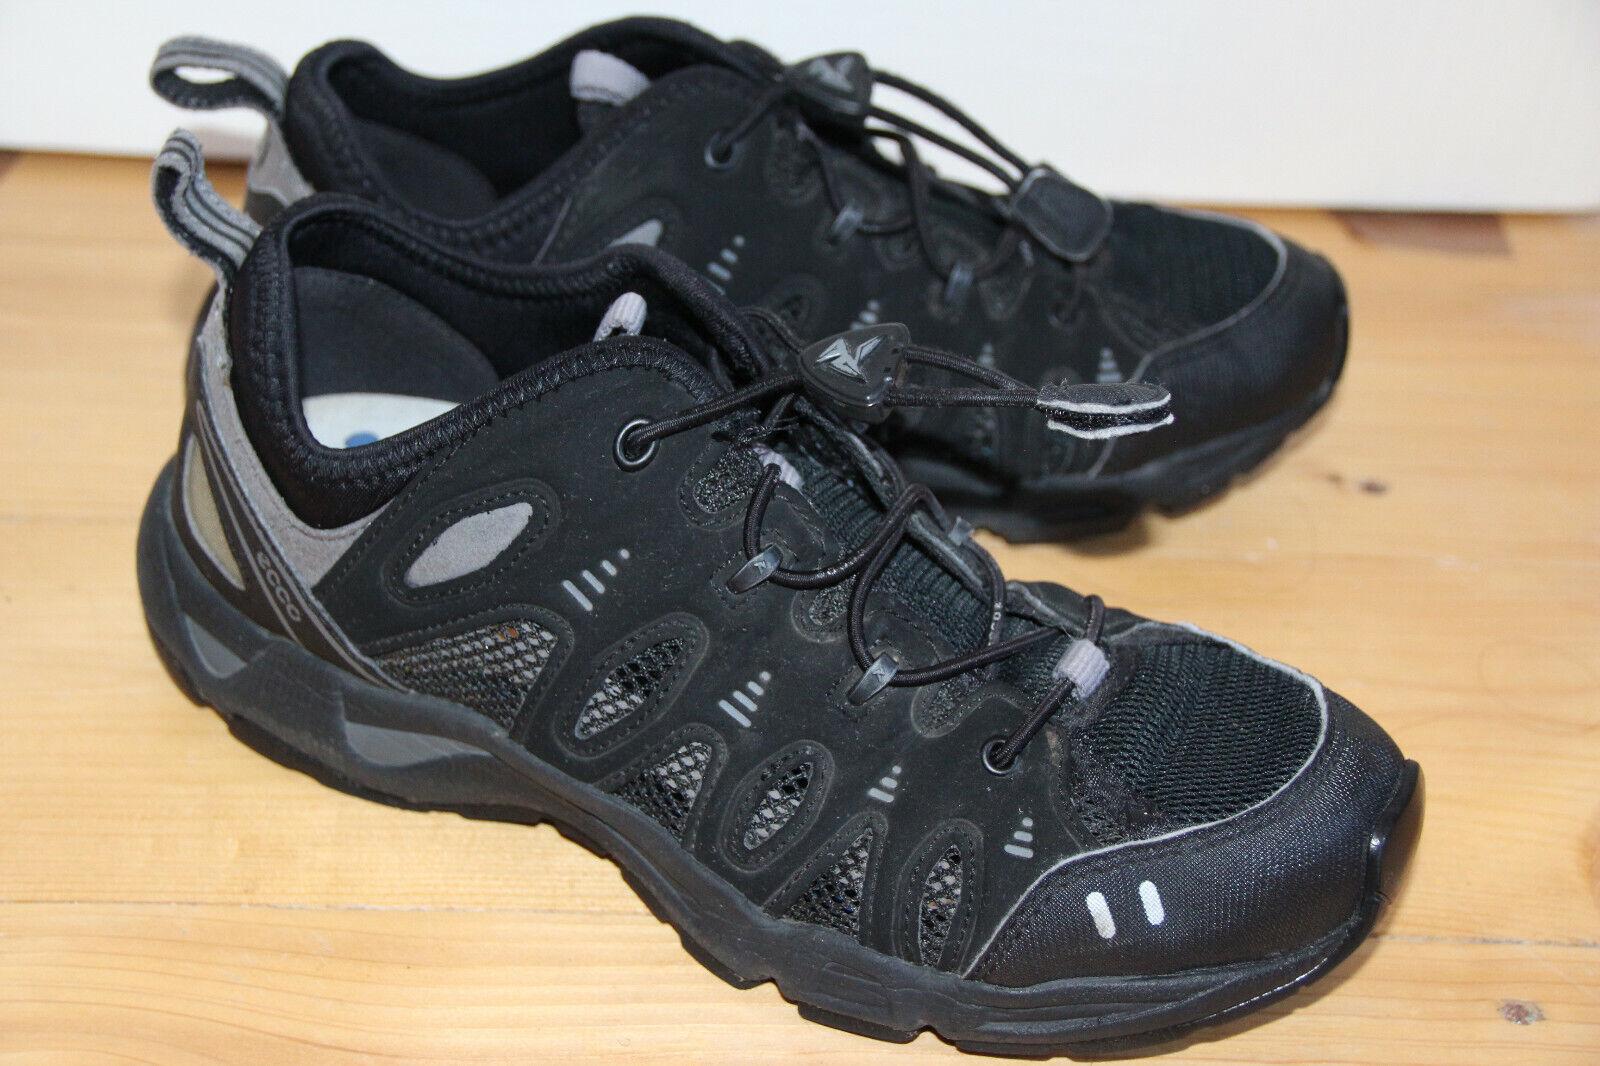 hot sale online united kingdom 100% quality Ecco Schuhe Herren Sneaker Test Vergleich +++ Ecco Schuhe